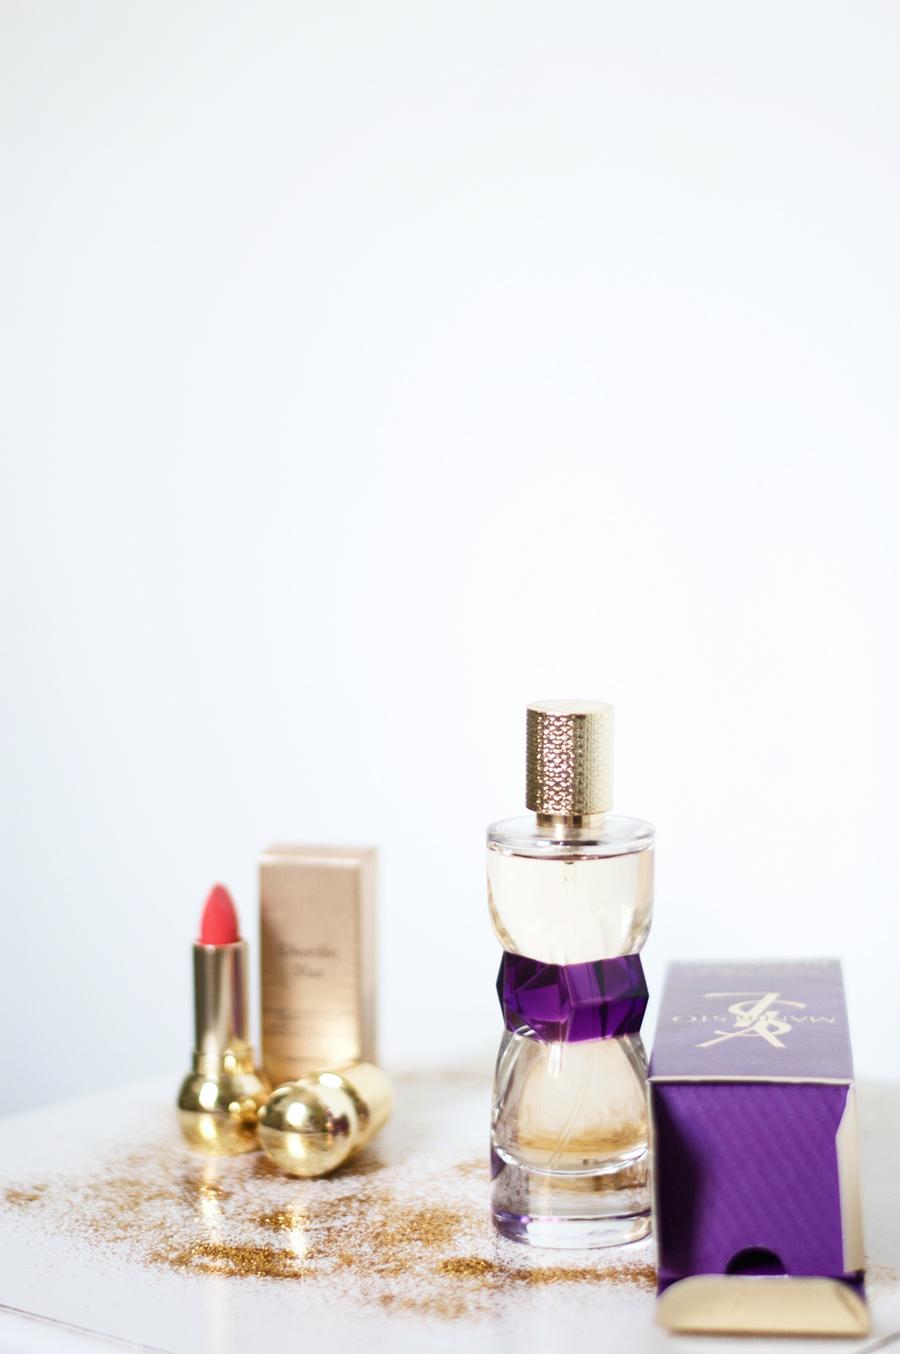 Diorific & Yves Saint Laurent: Spreme Opulence